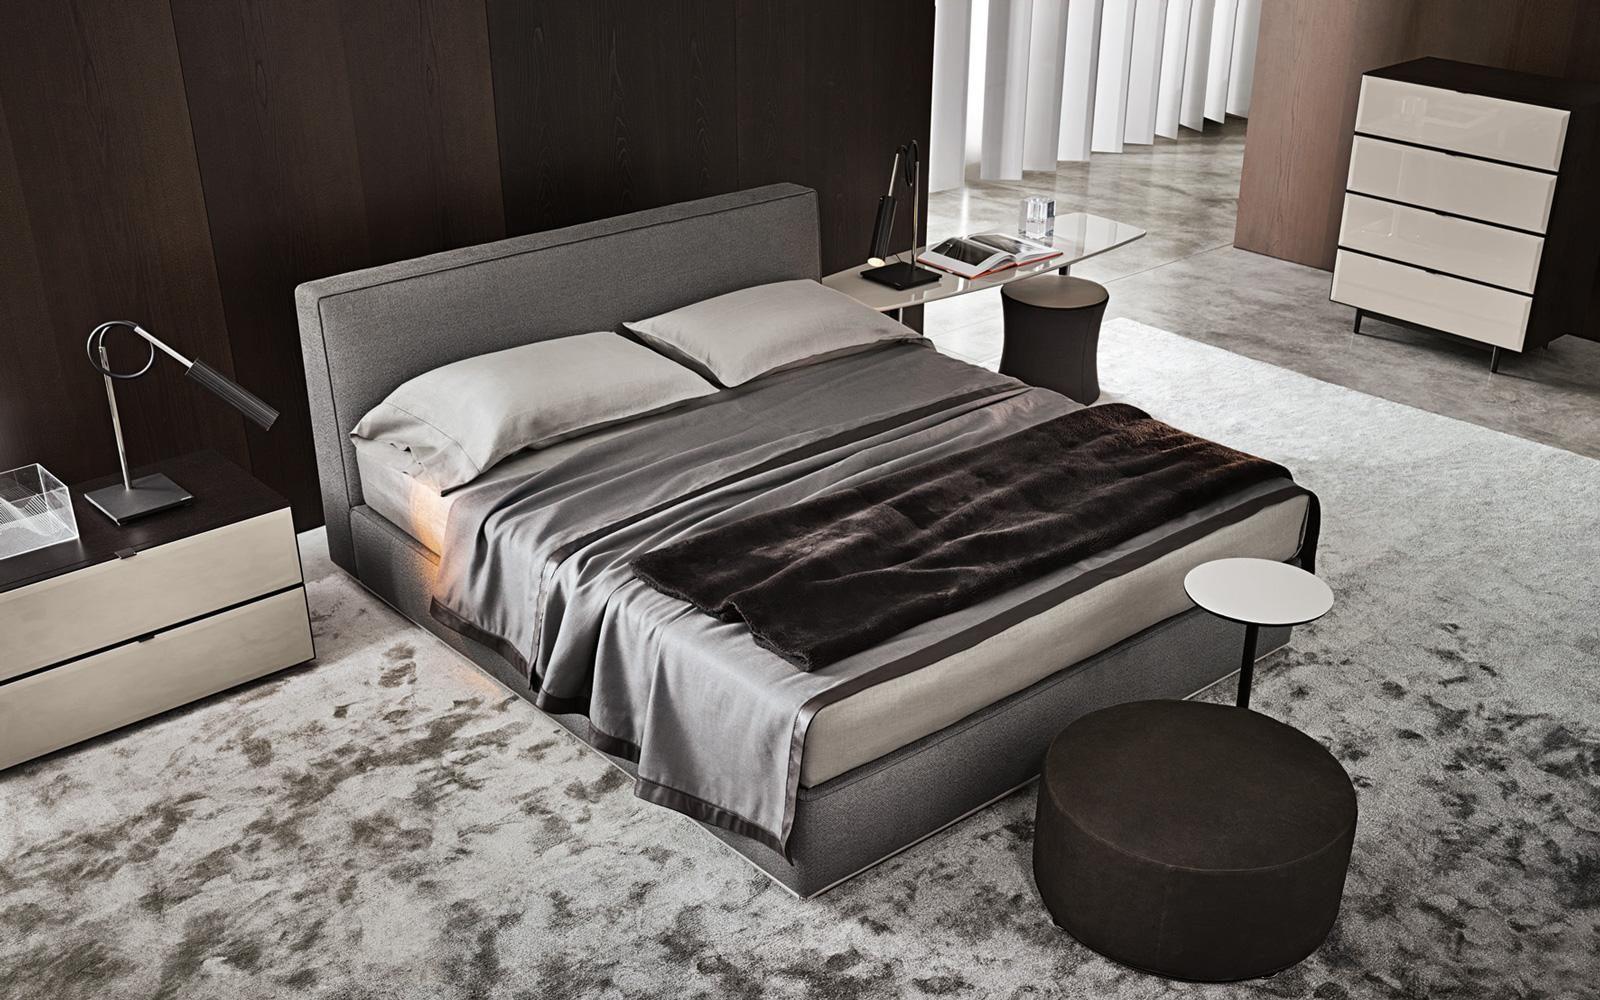 Minotti Powell Bett Design Rodolfo Dordoni Polsterbett Zeitgemass